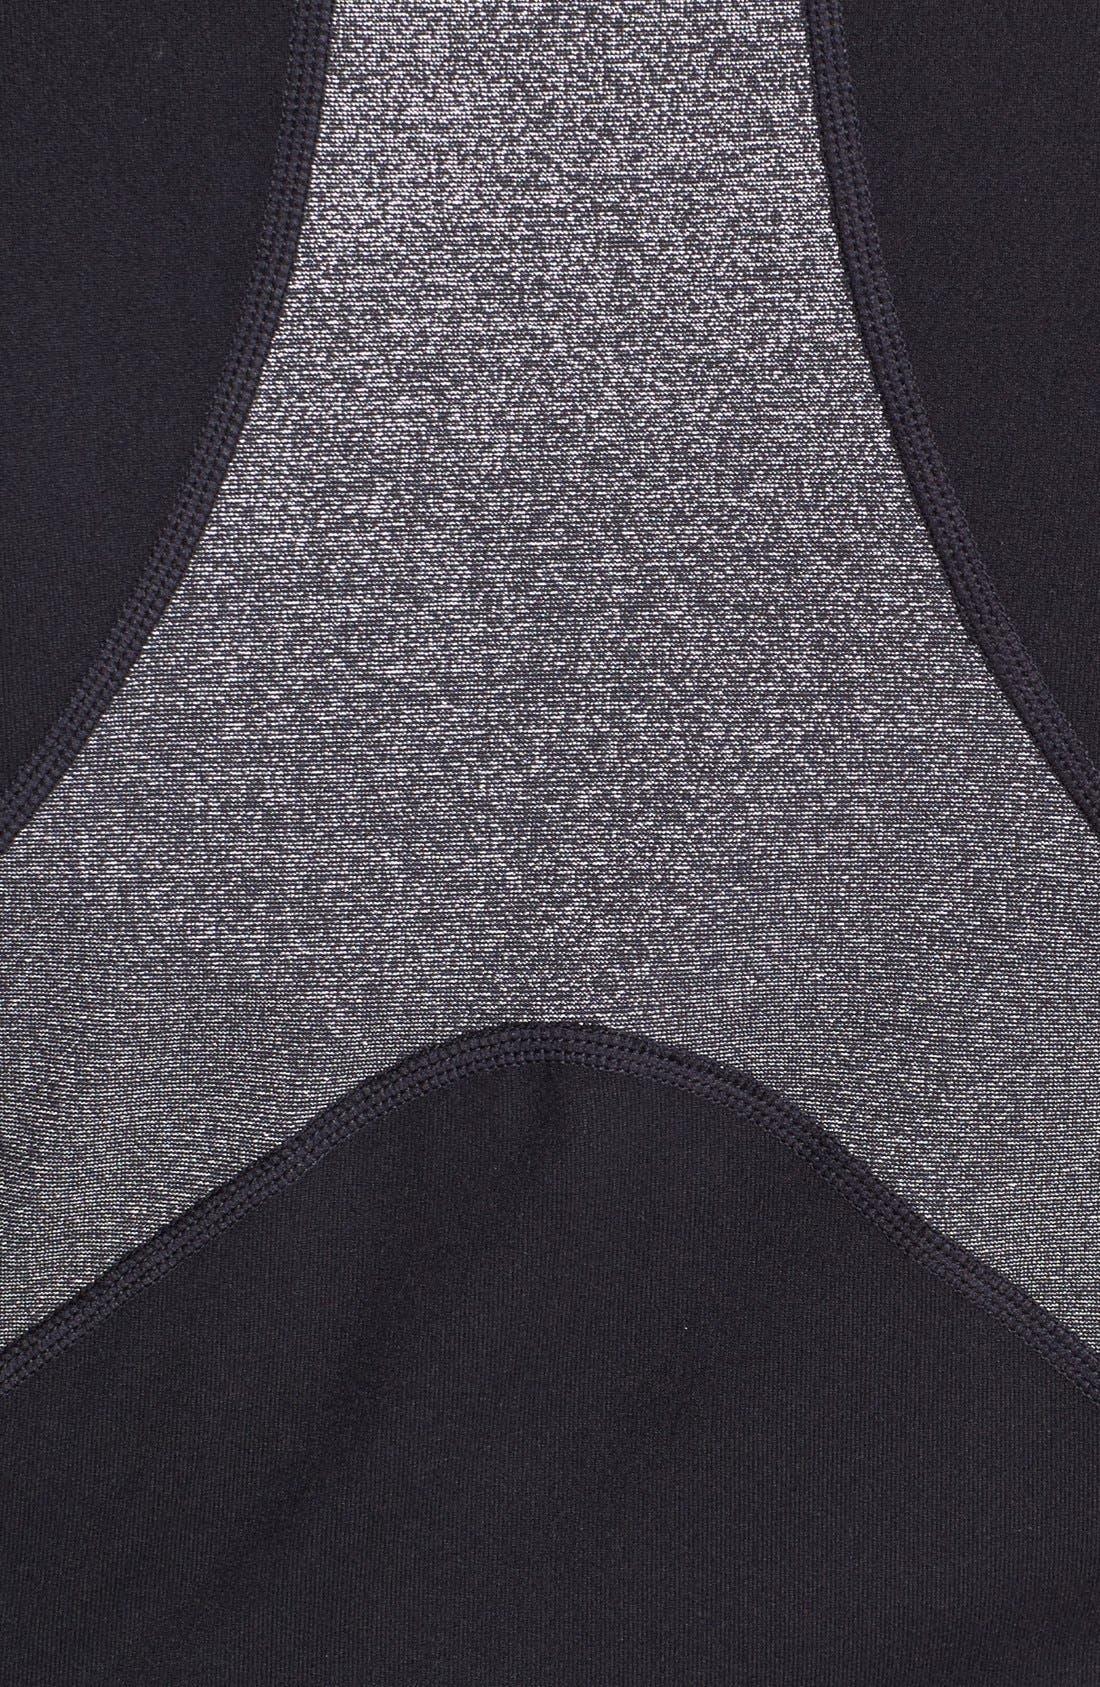 Alternate Image 3  - Zella 'Luxe Mix' Jacket (Plus Size)